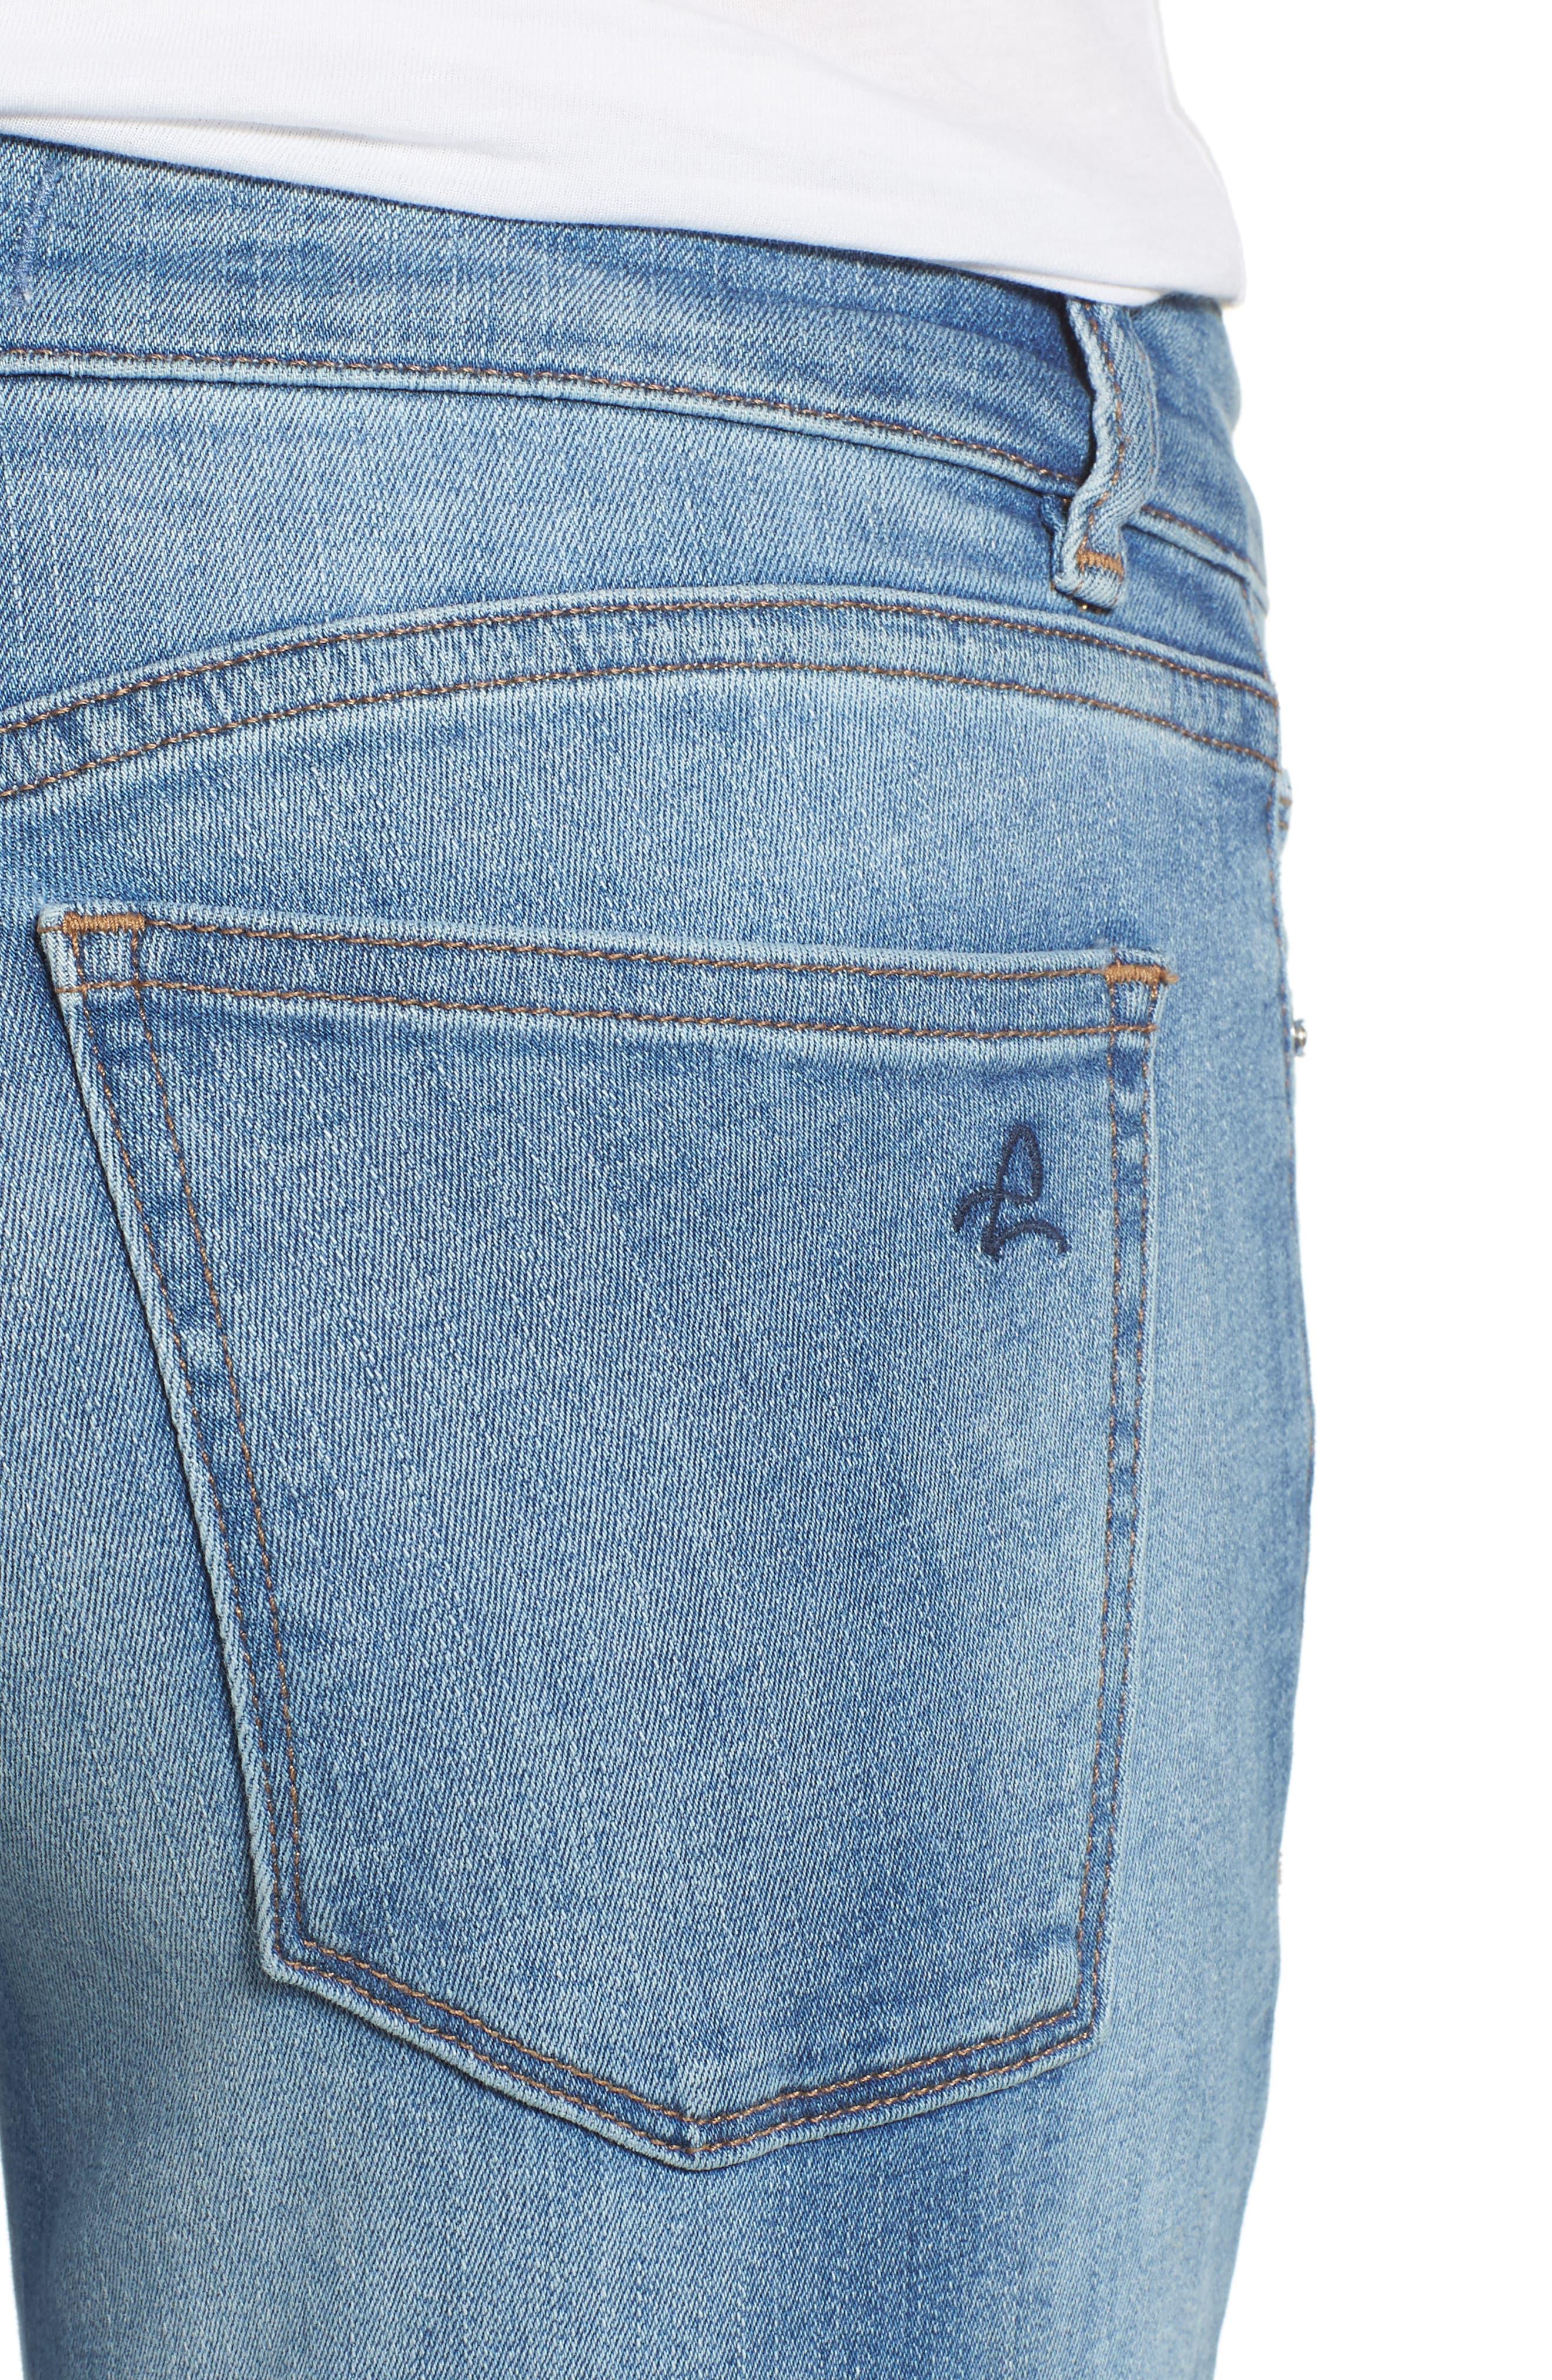 Florence Instasculpt Crop Skinny Jeans,                             Alternate thumbnail 4, color,                             Cavalier